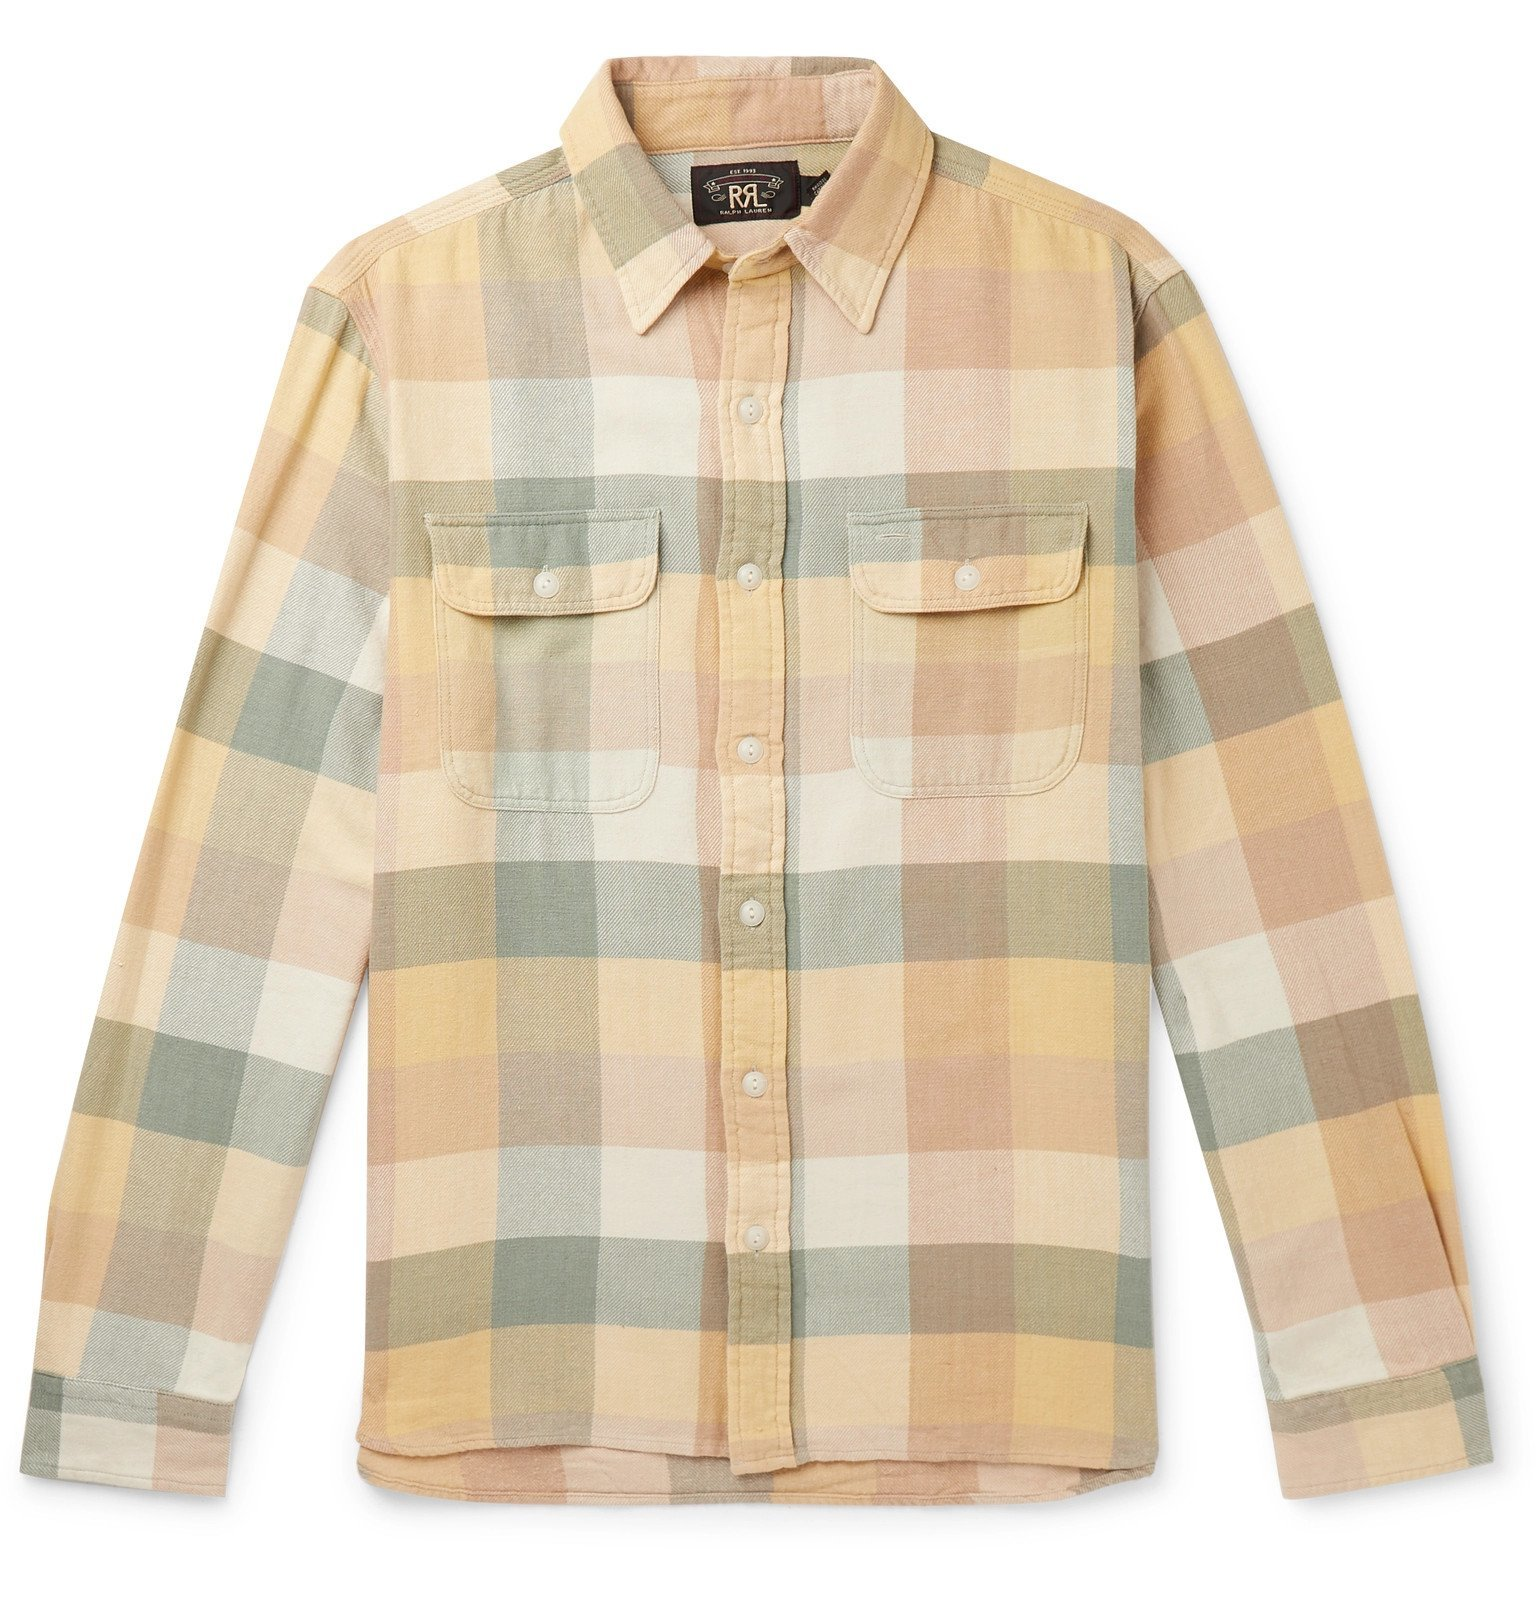 RRL - Checked Cotton Shirt - Yellow